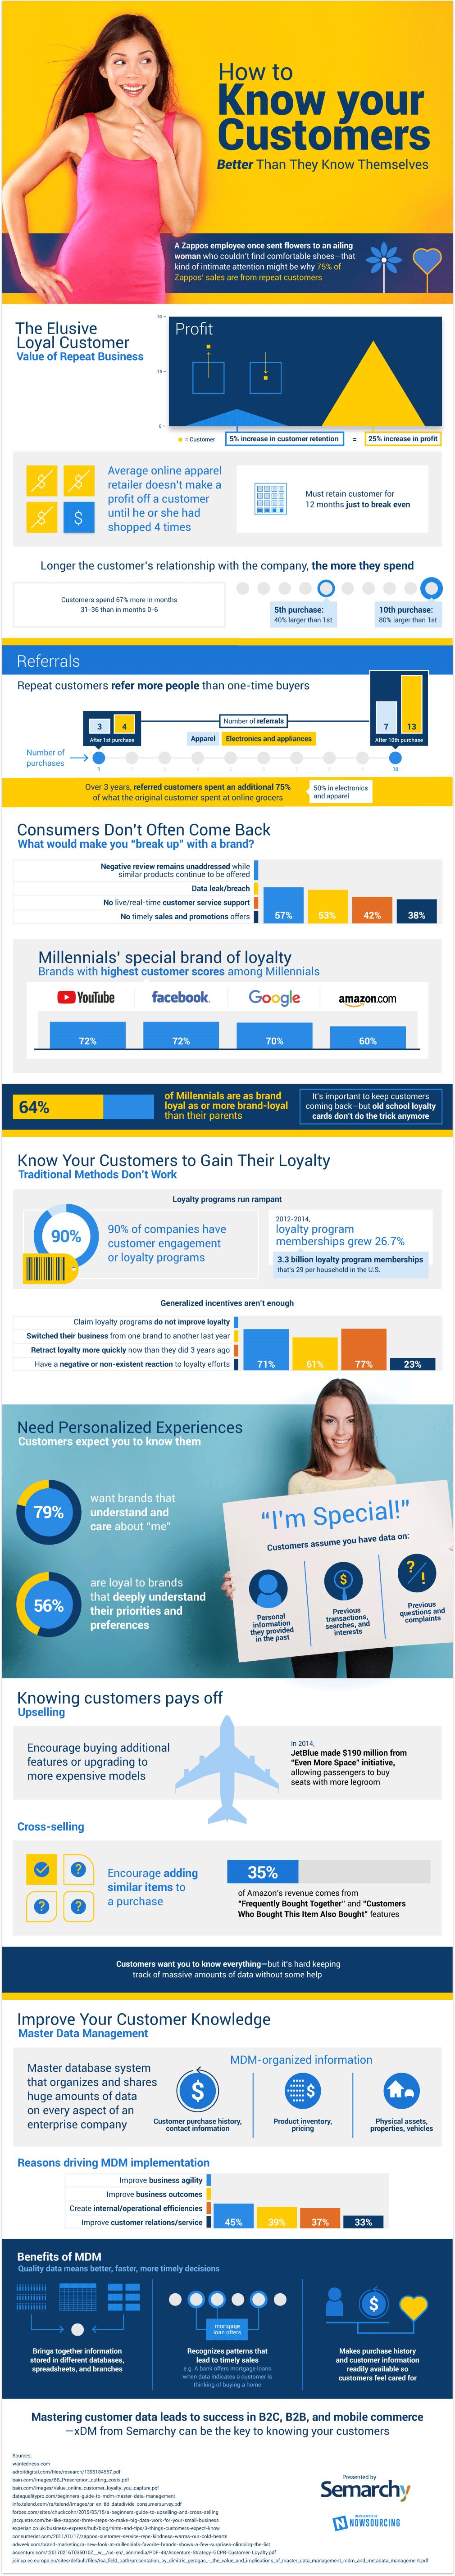 Customer MDM Infographic Upsell Cross-Sell Image repeat customers